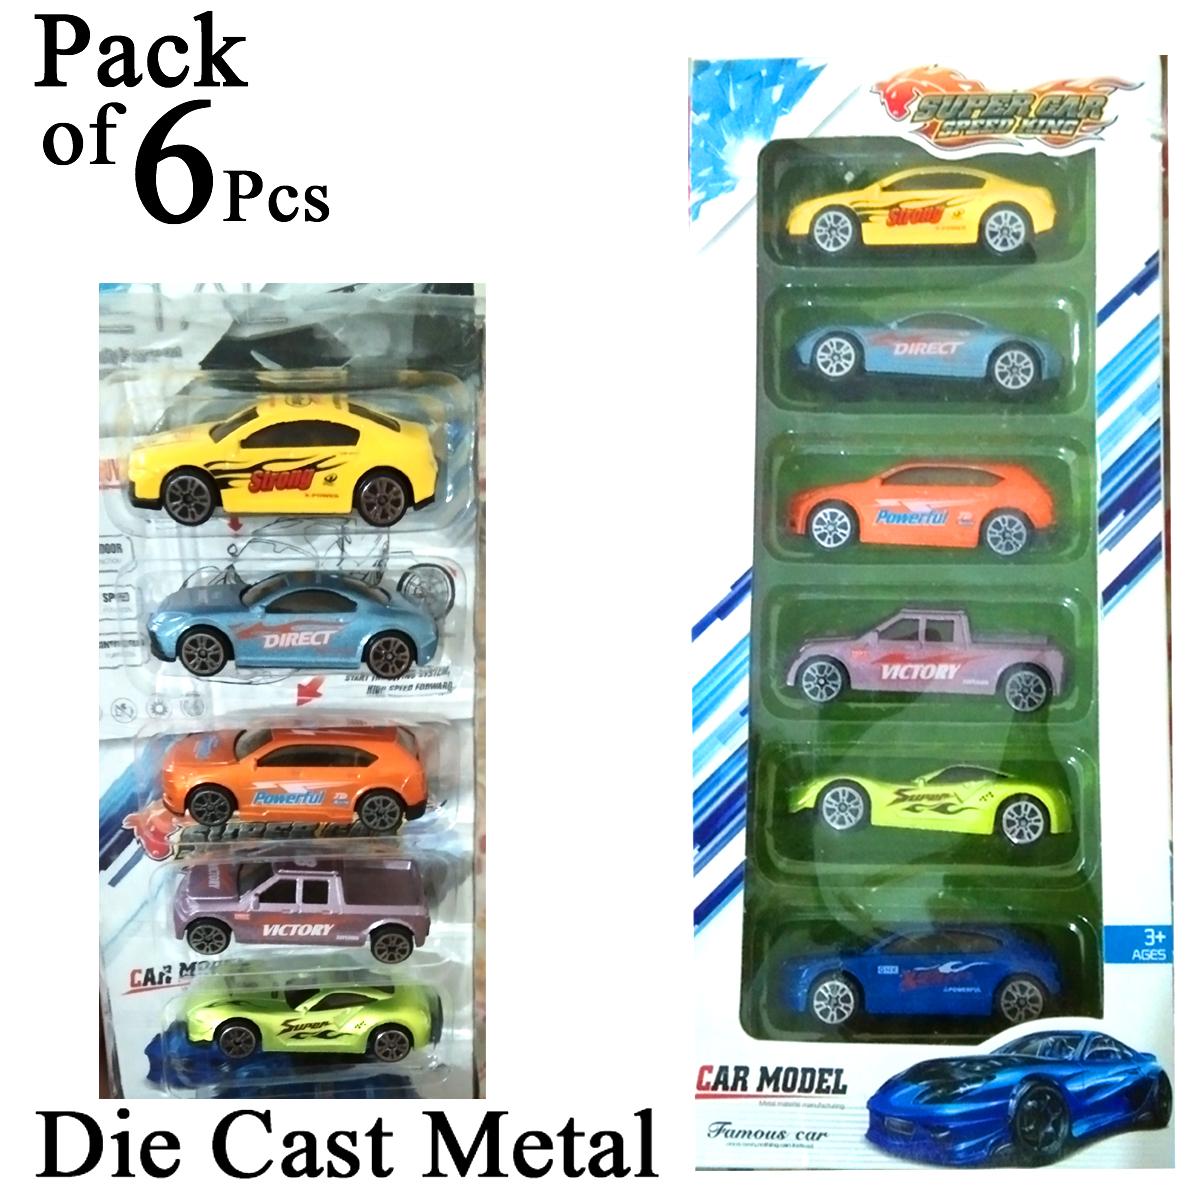 Pack of 6 Pcs Die Cast Metal Car Set Toys Kids and Boys Diecast